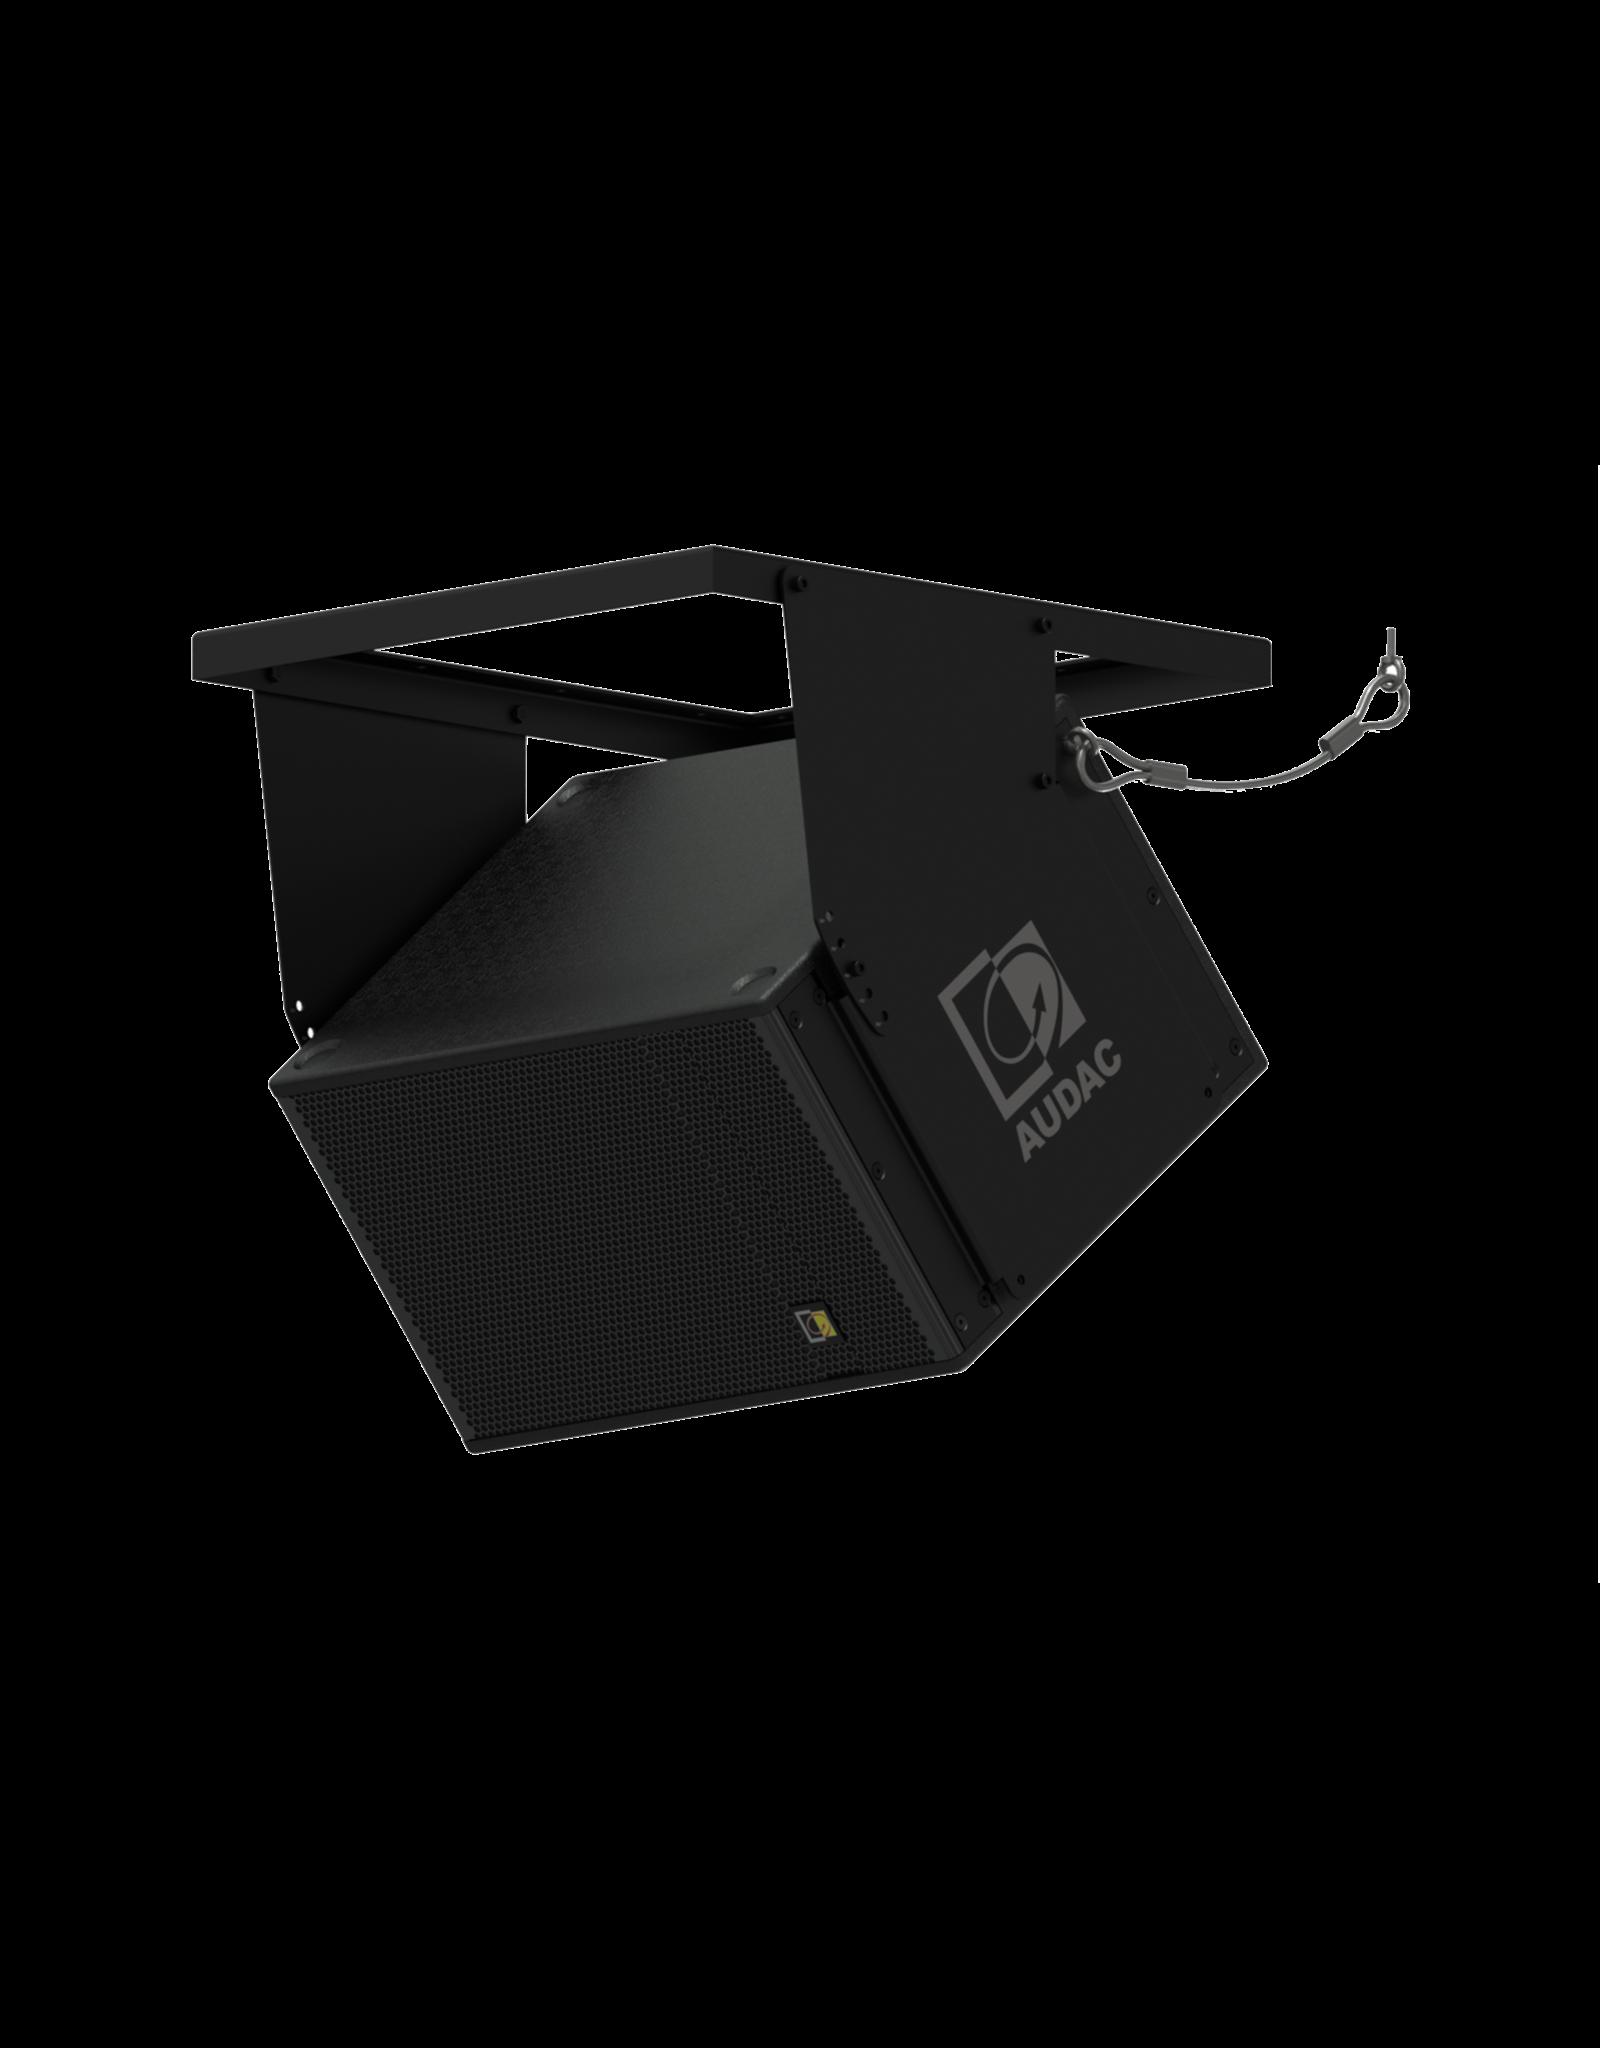 Audac ceiling flying system for 1x FX 3.15 - black Black